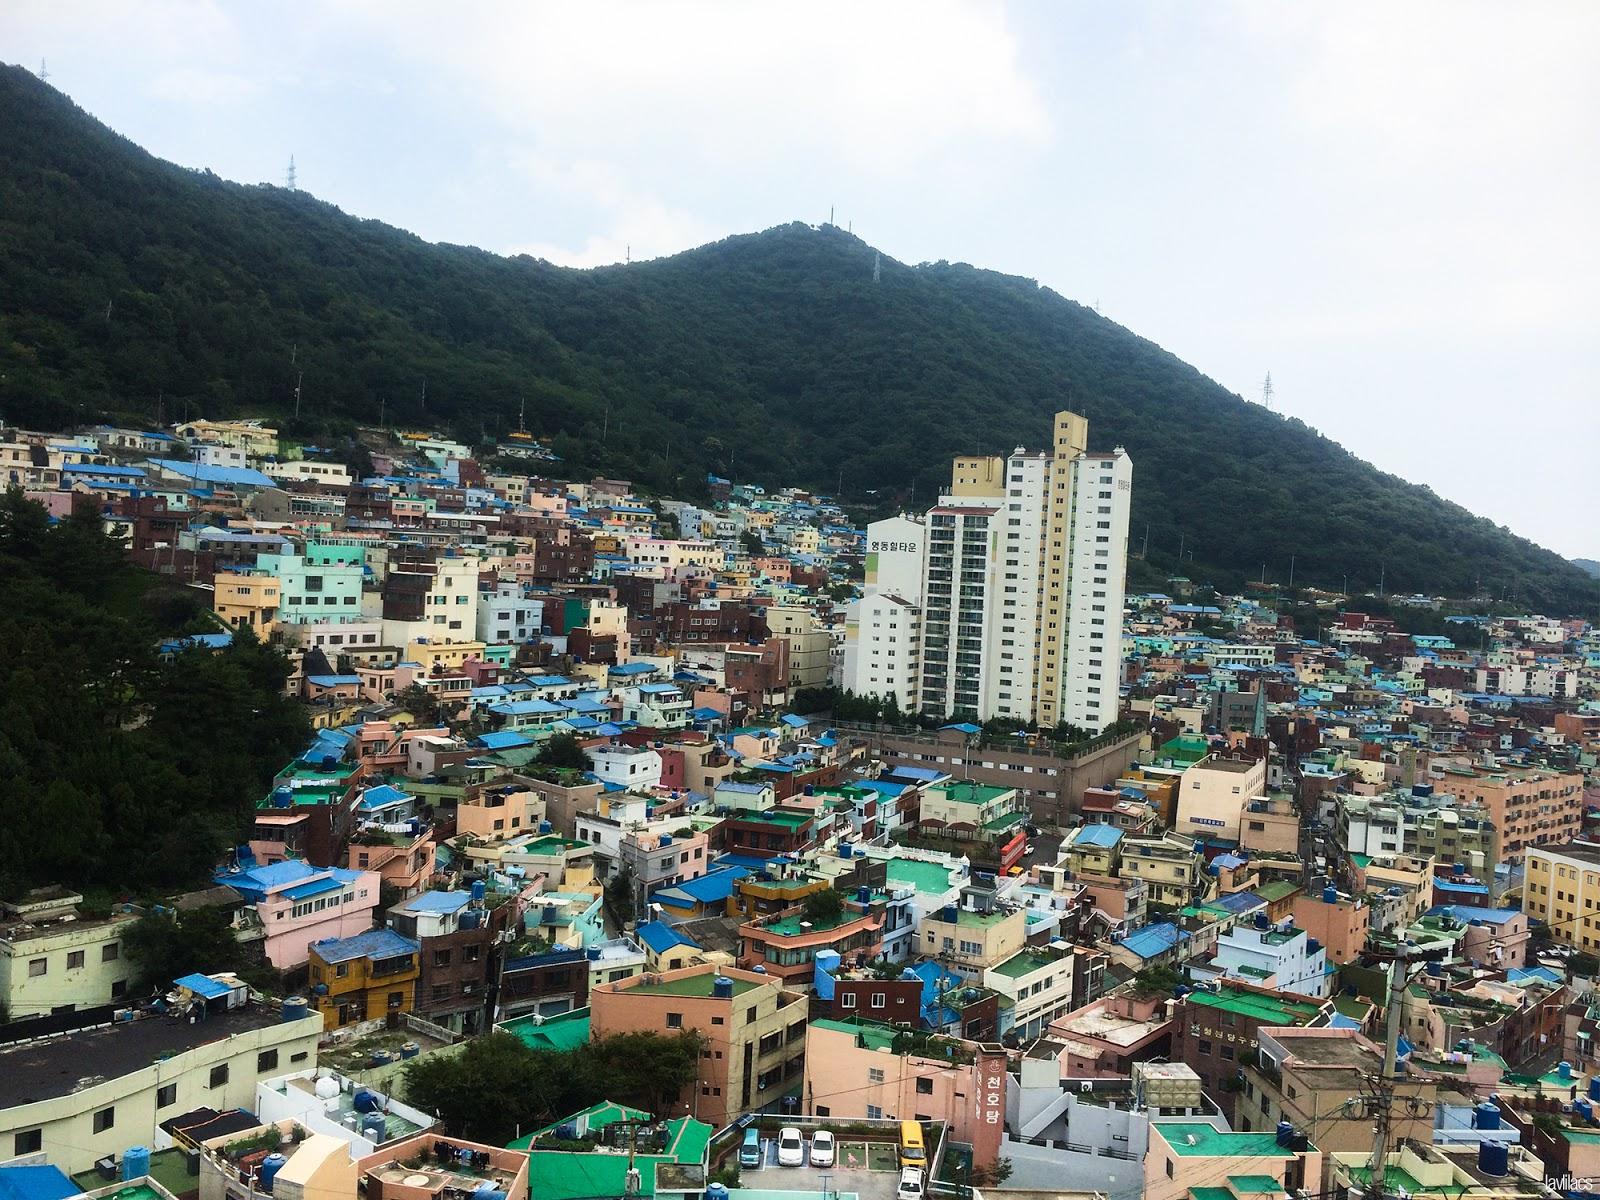 Seoul, Korea - Summer Study Abroad 2014 - Gamcheon Culture Village colorful homes